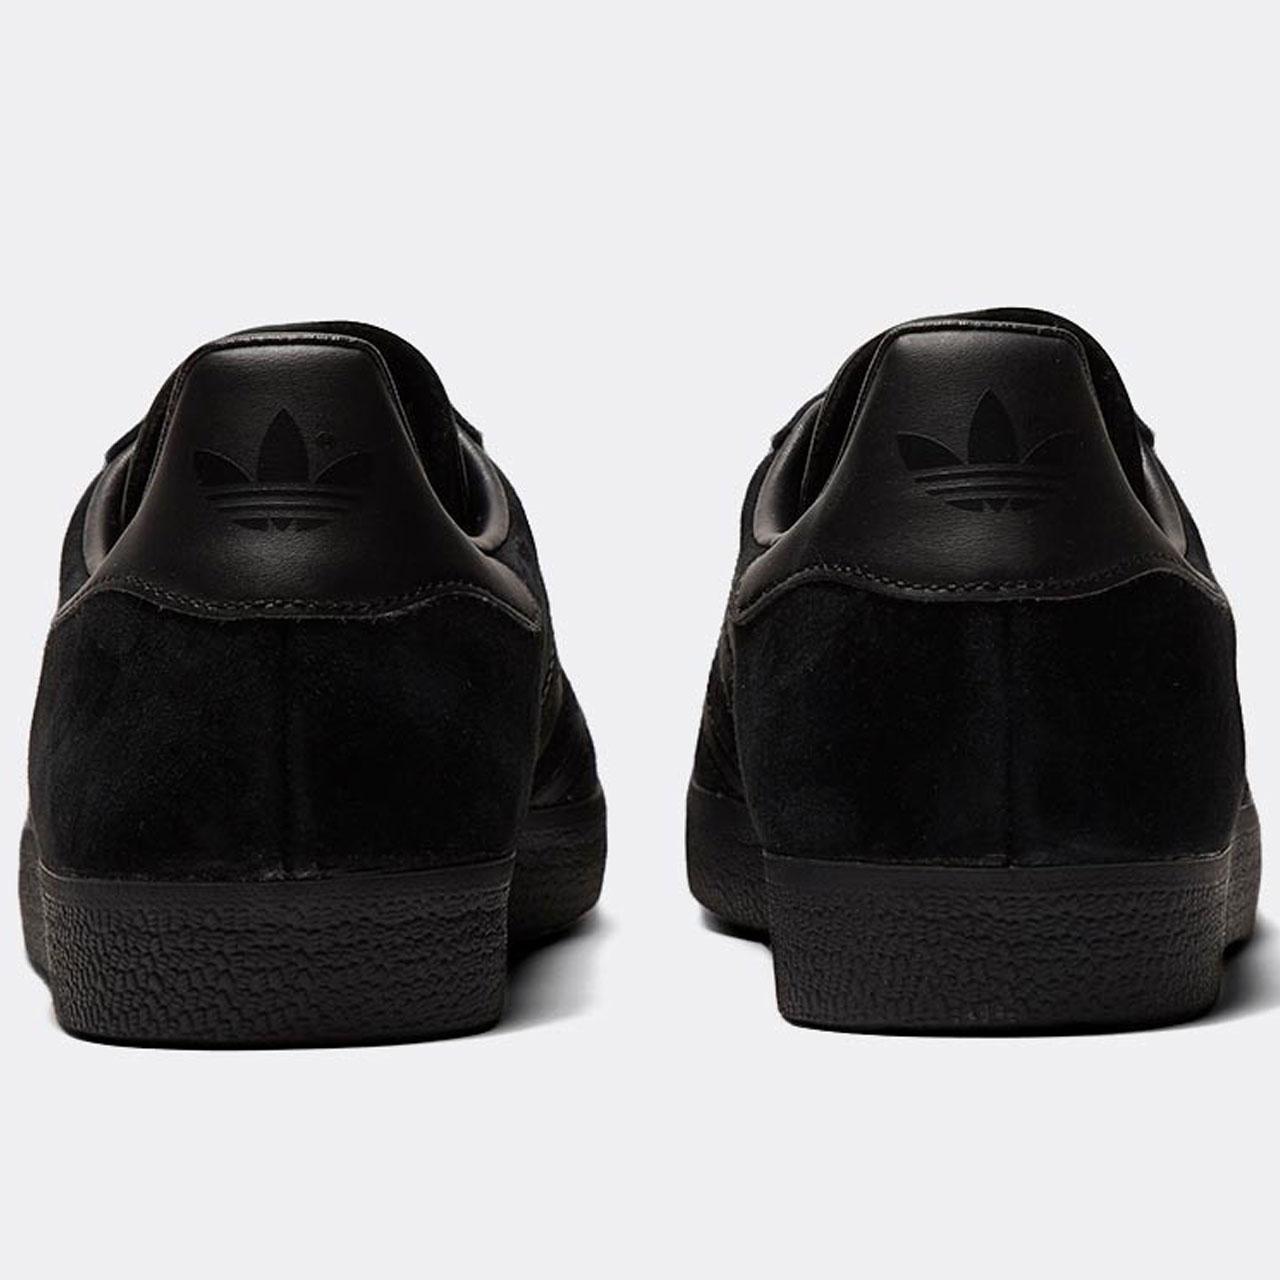 کفش مردانه آدیداس مدل GAZELLE